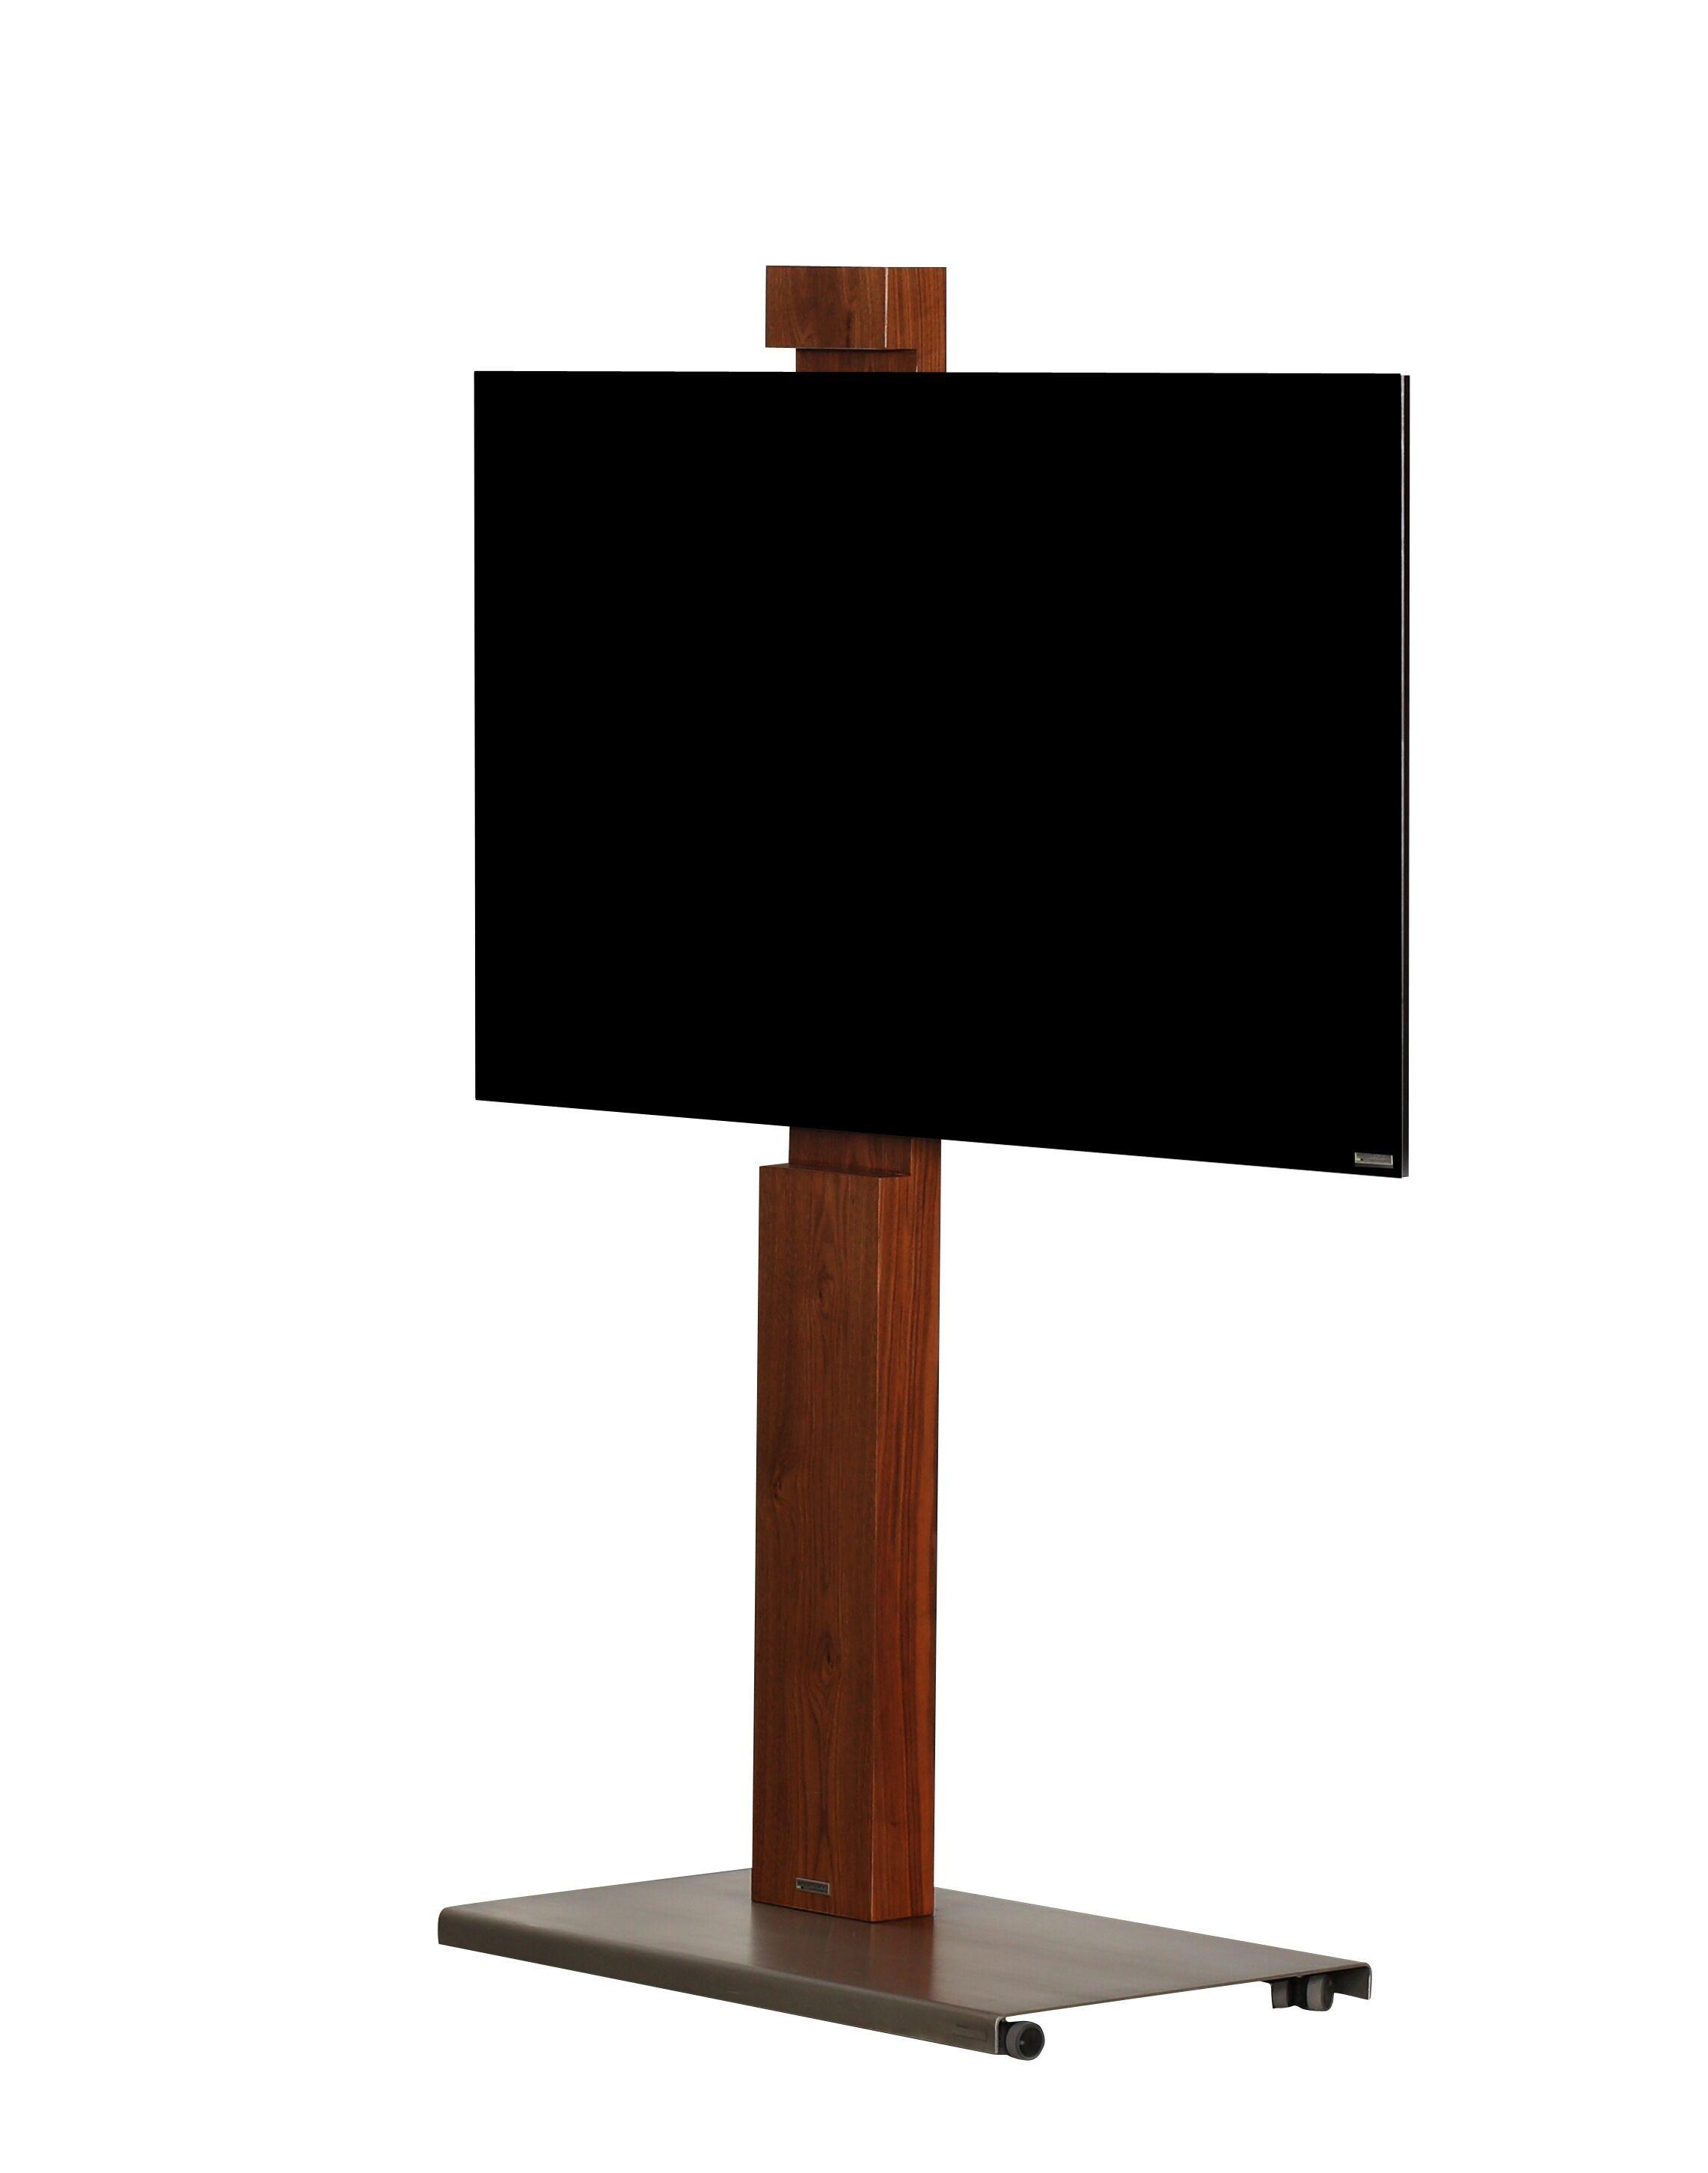 Tv Halter Column Art118 H Produktdesign Wissmann Raumobjekte  # Meuble Tv Murale Meuble Tv Murale Design Ronna Mobilo Design